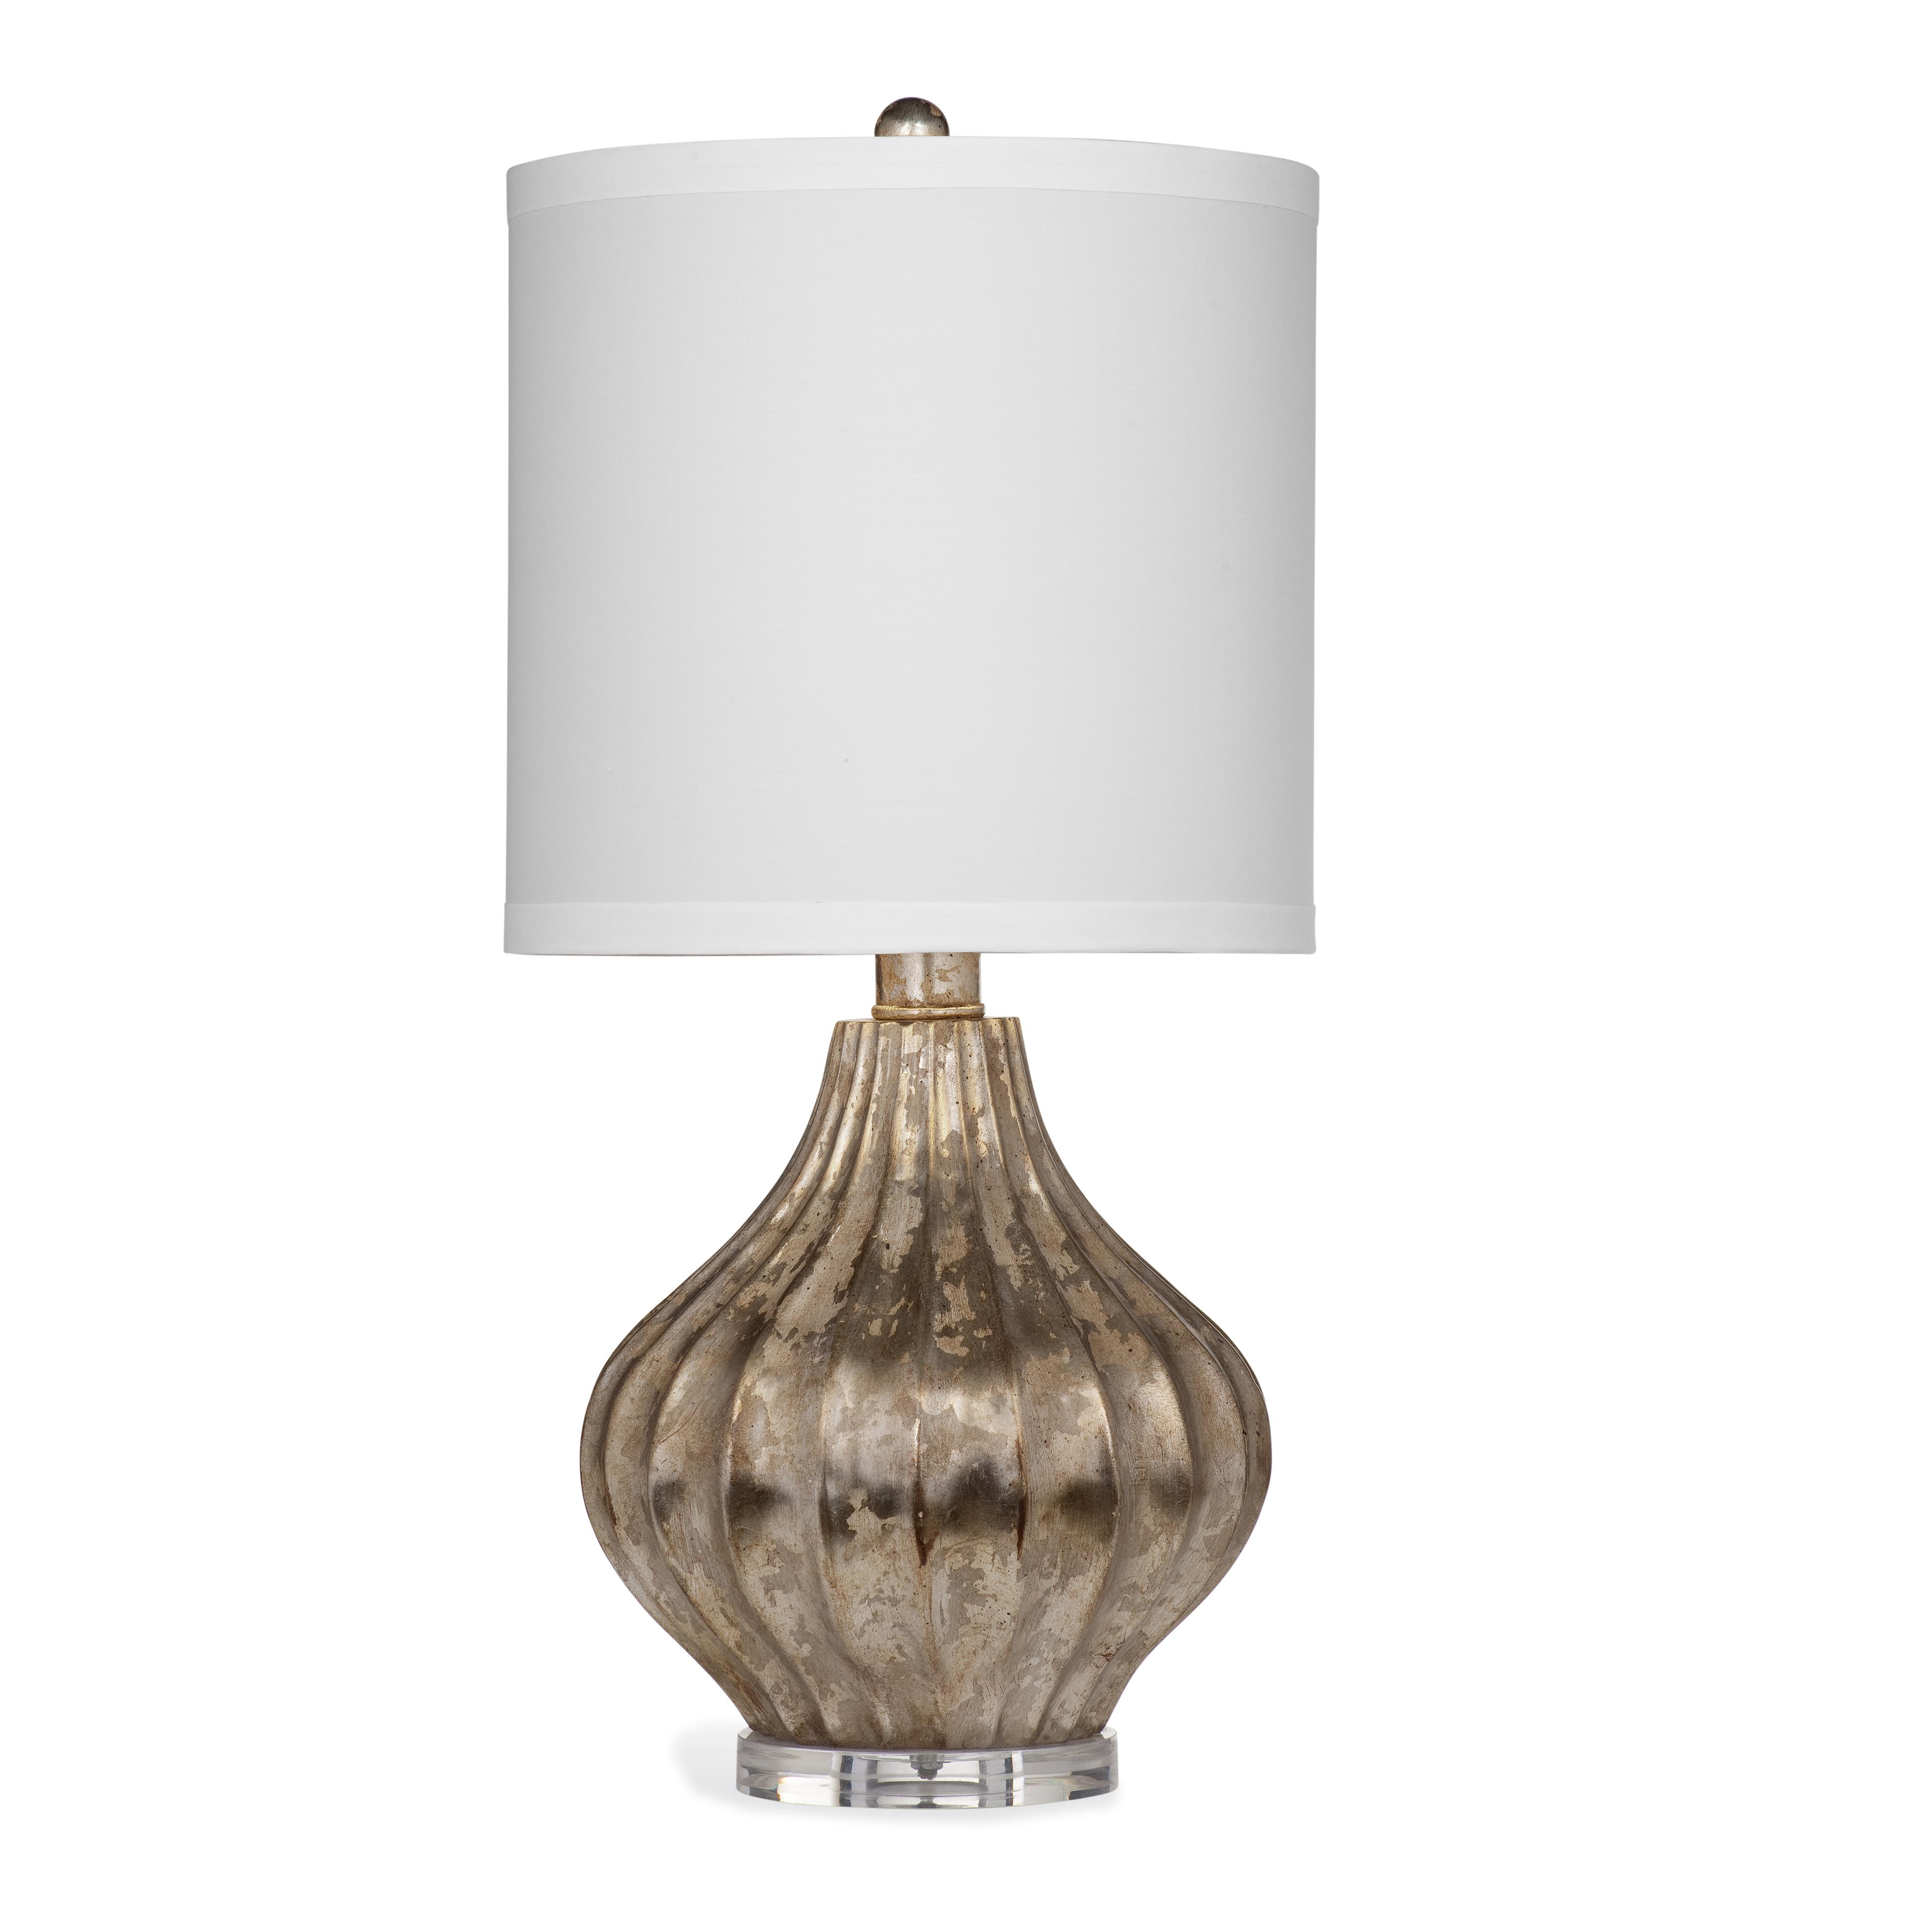 Burbank Table Lamp